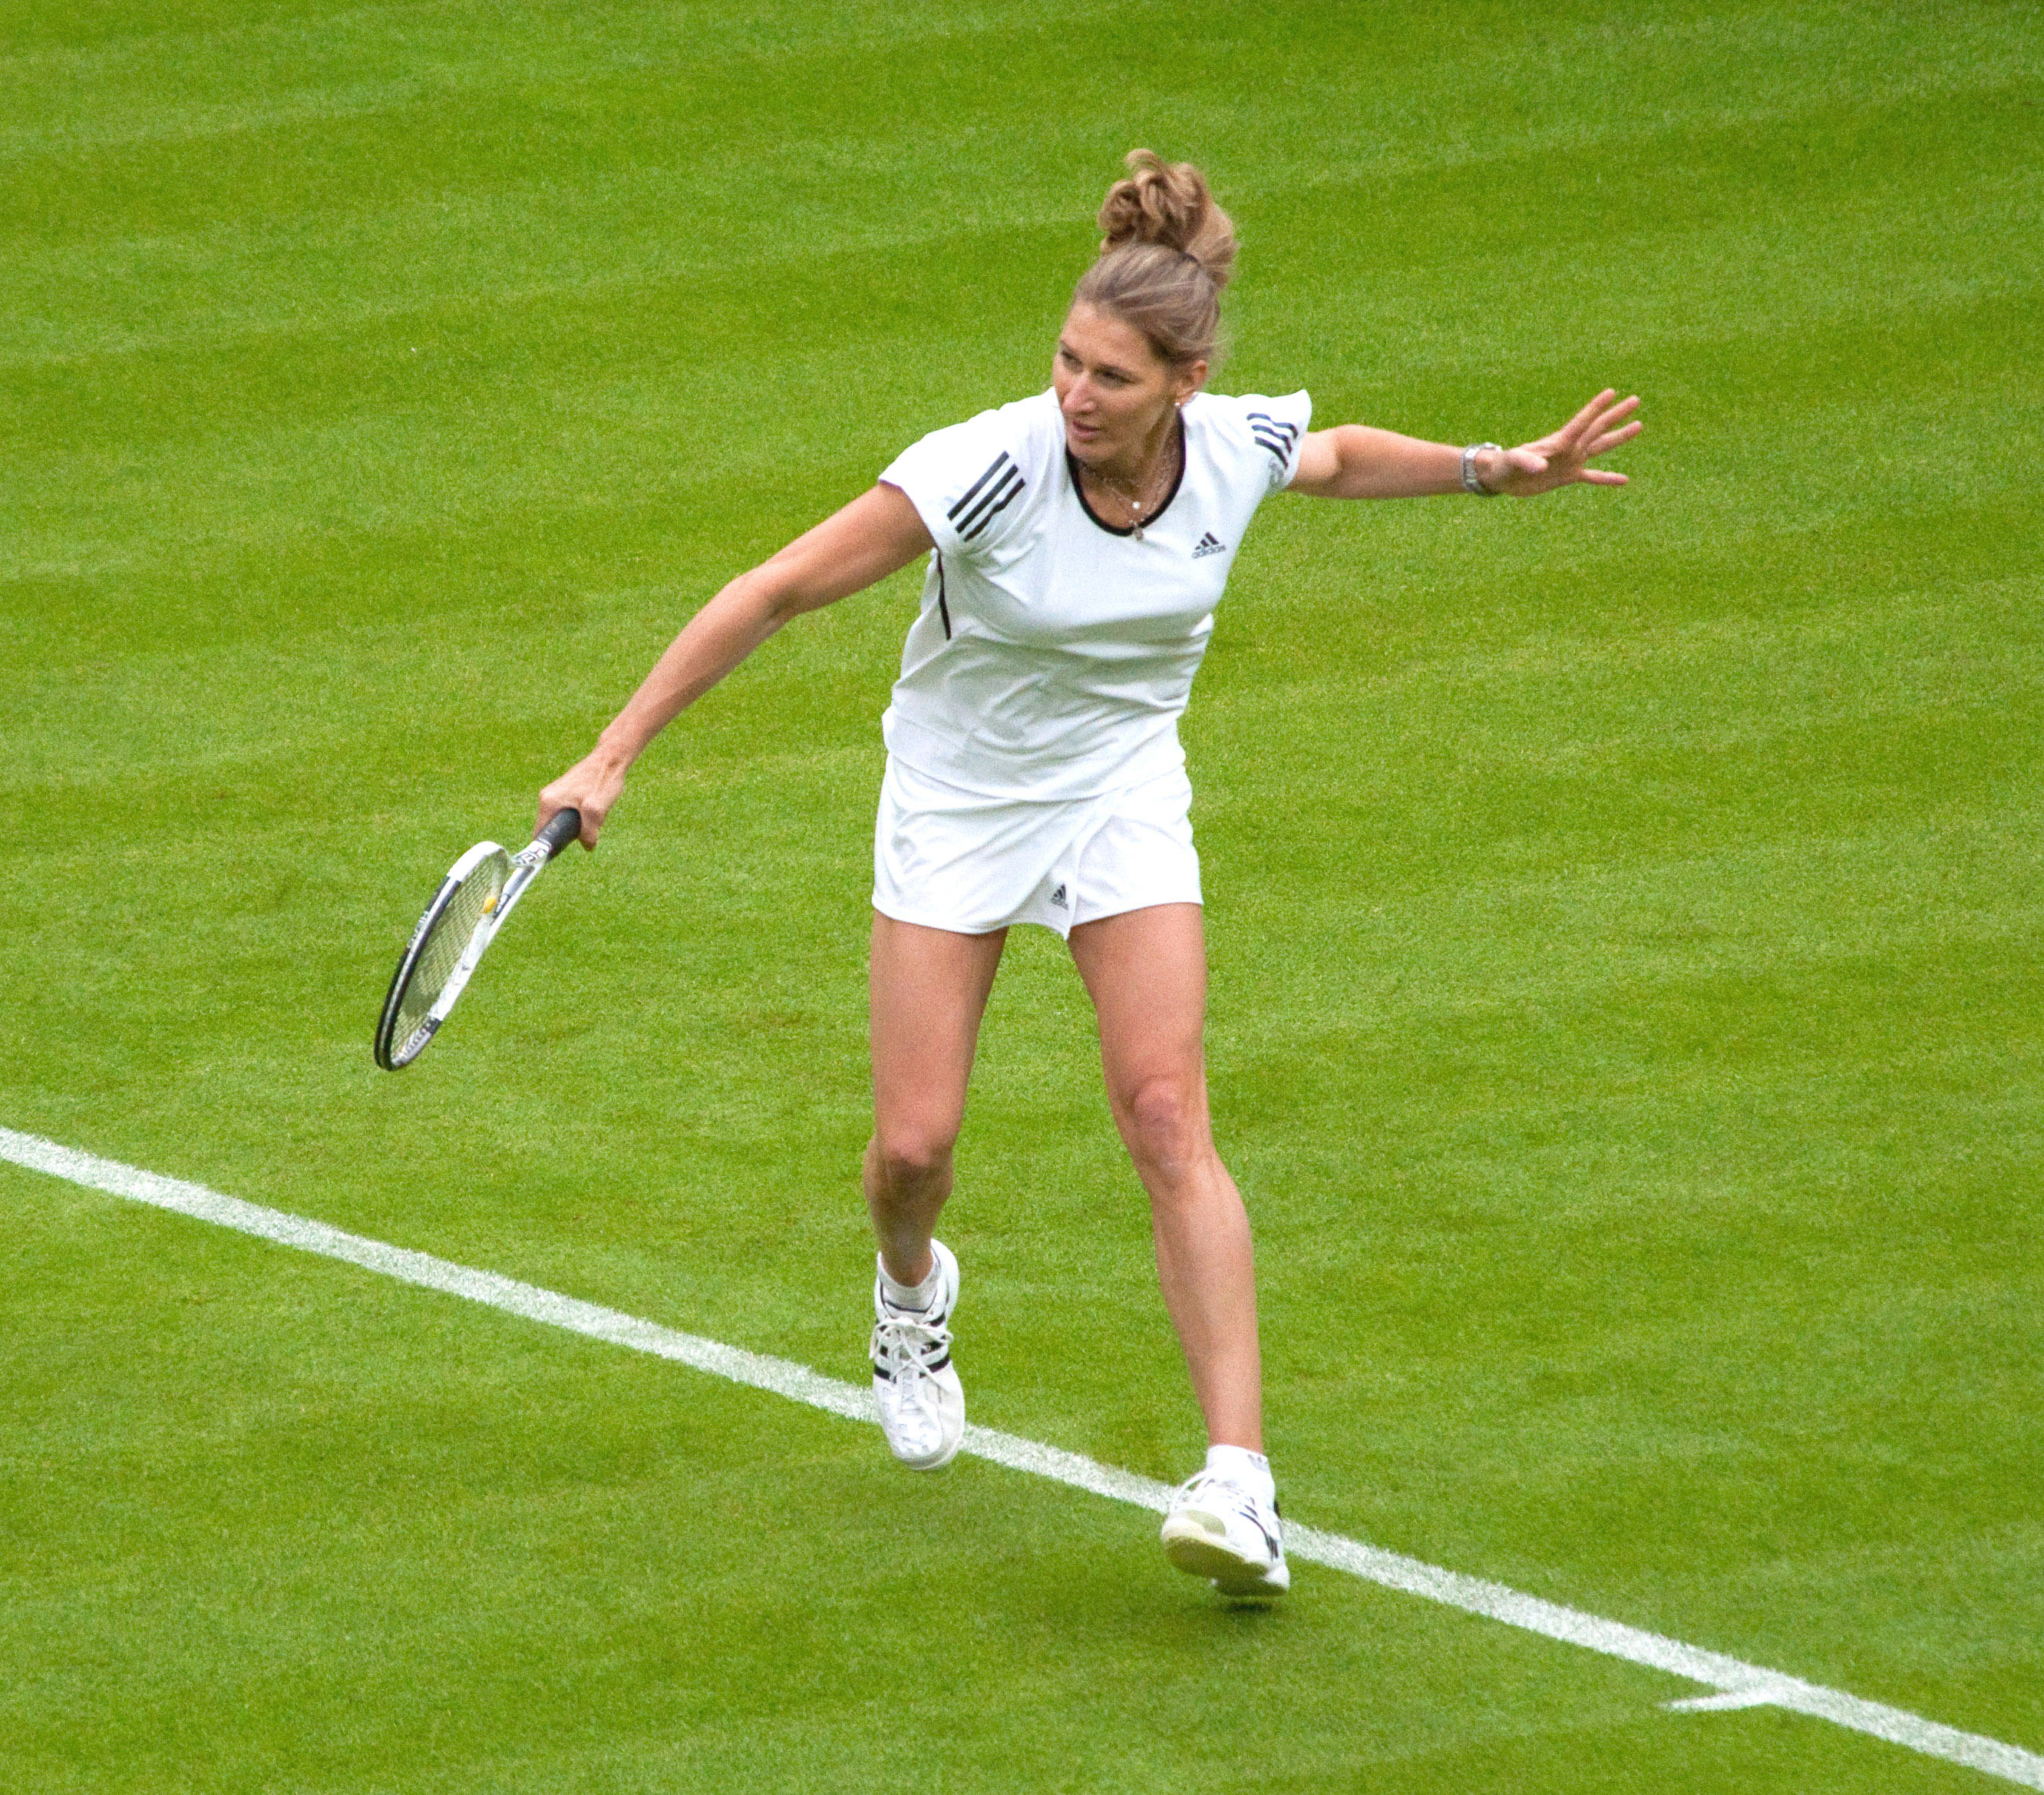 File Steffi Graf Wimbledon 2009 11 Wikimedia mons